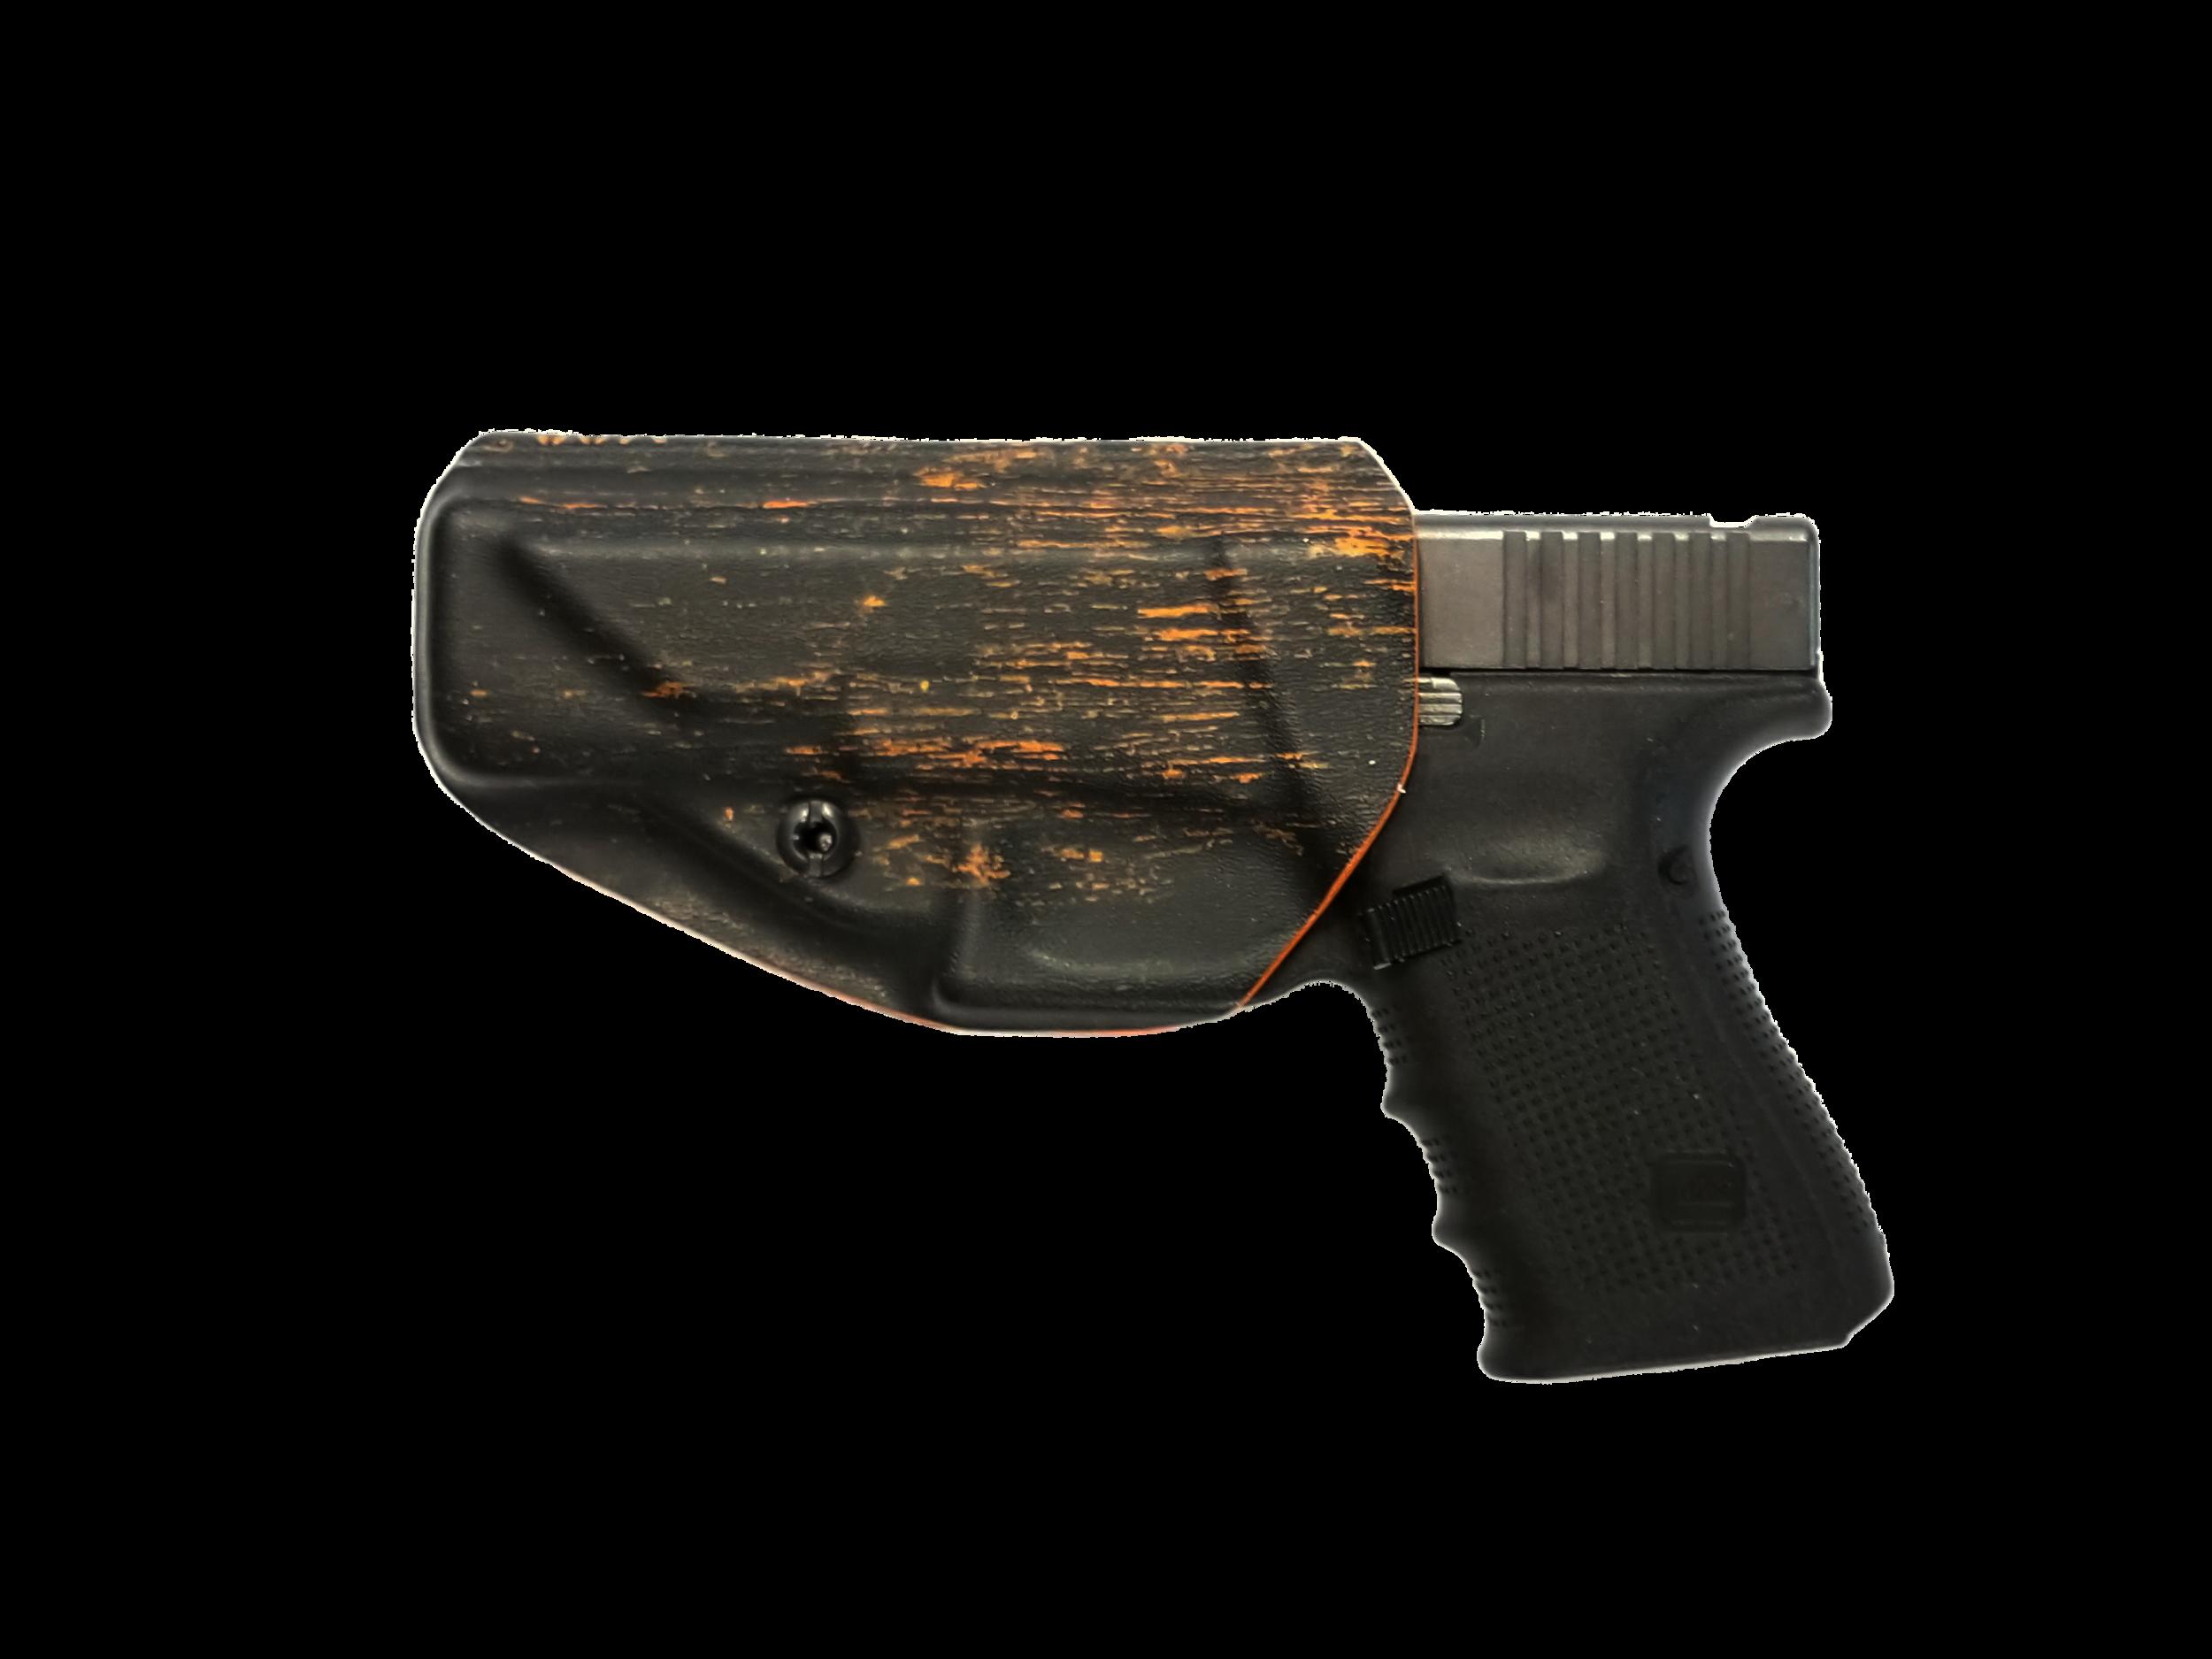 Glock 17 IWB kydex holster